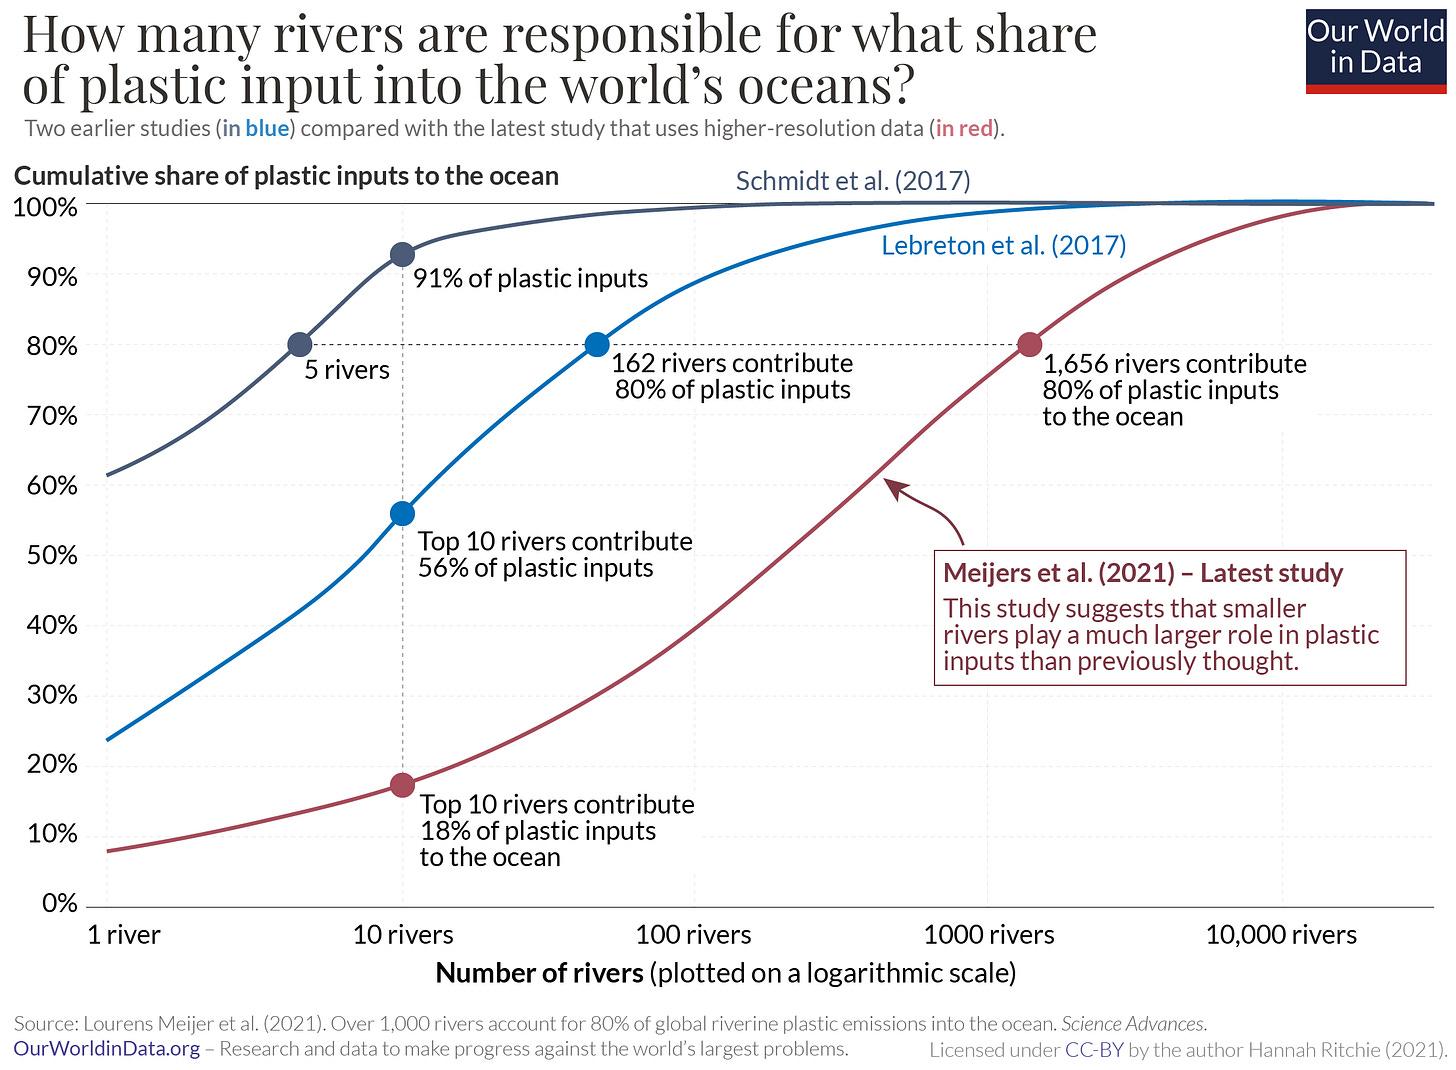 Plastic river inputs meijer et al. 2021